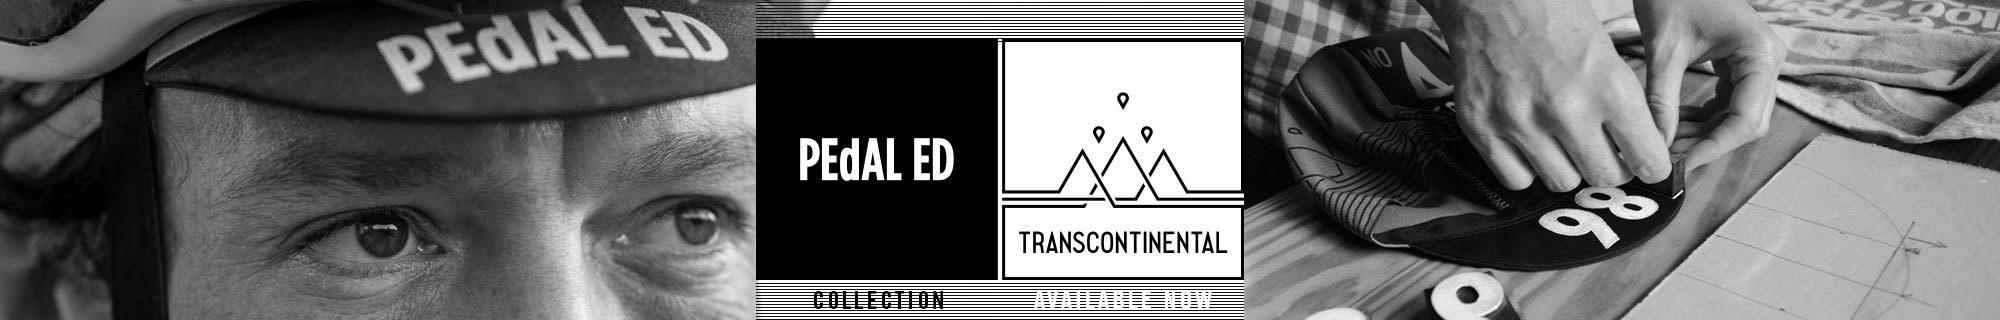 pedal ed